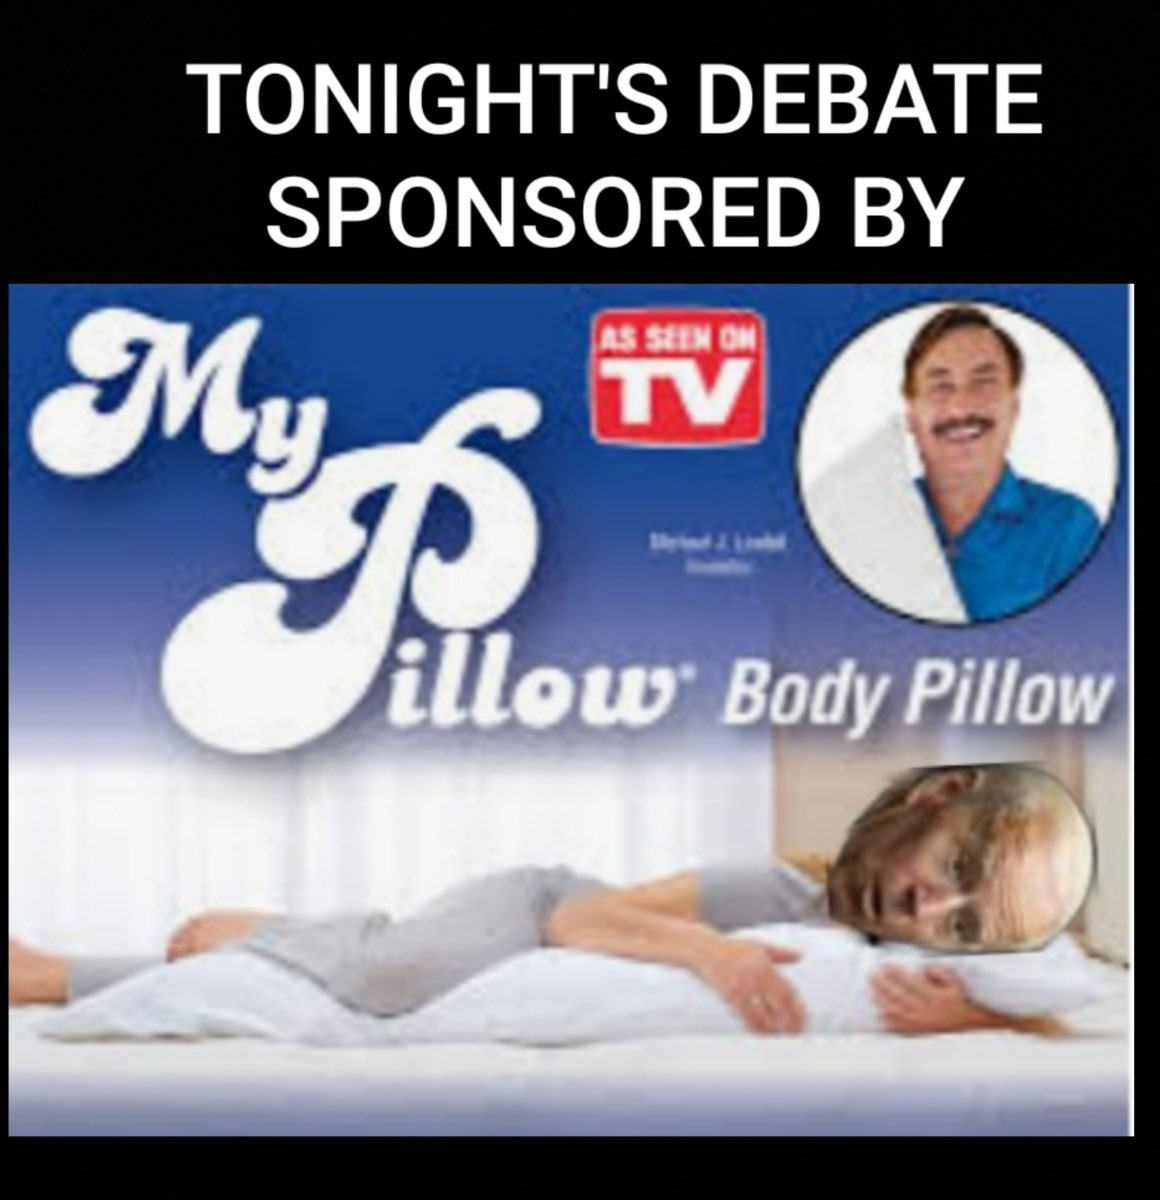 It's exhausting keeping up with.@realDonaldTrump @realMikeLindell has you covered #KAG #debate #SleepyJoe https://t.co/TFIq8XzLOJ